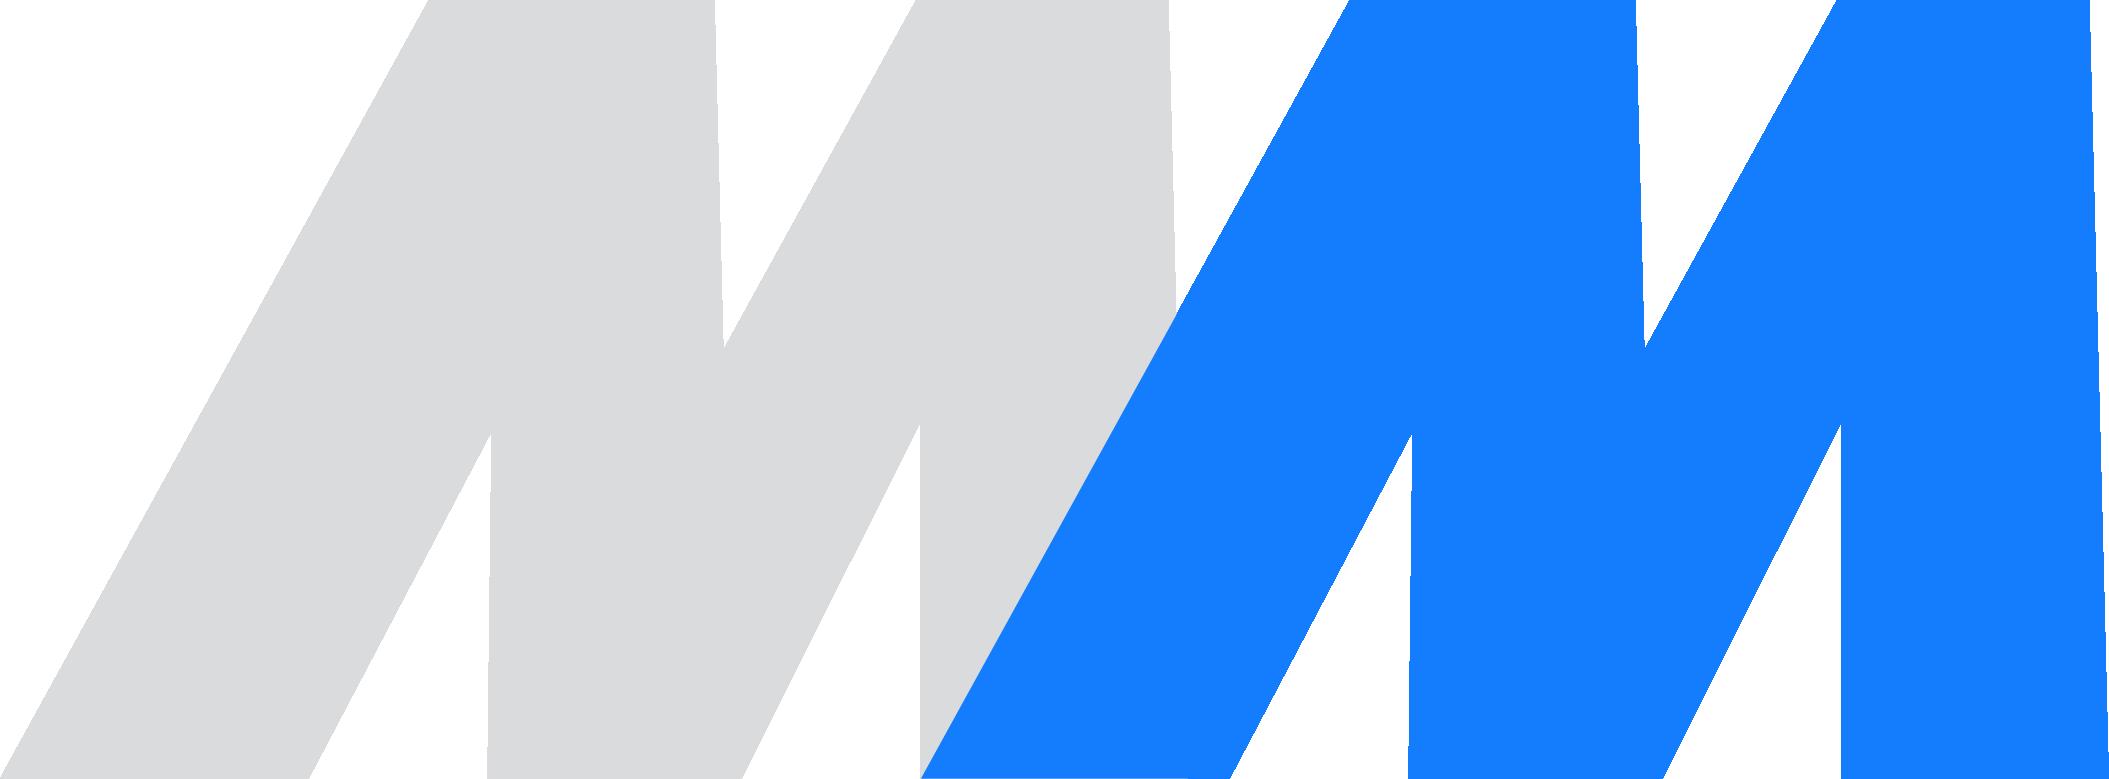 marketmotorsports.com